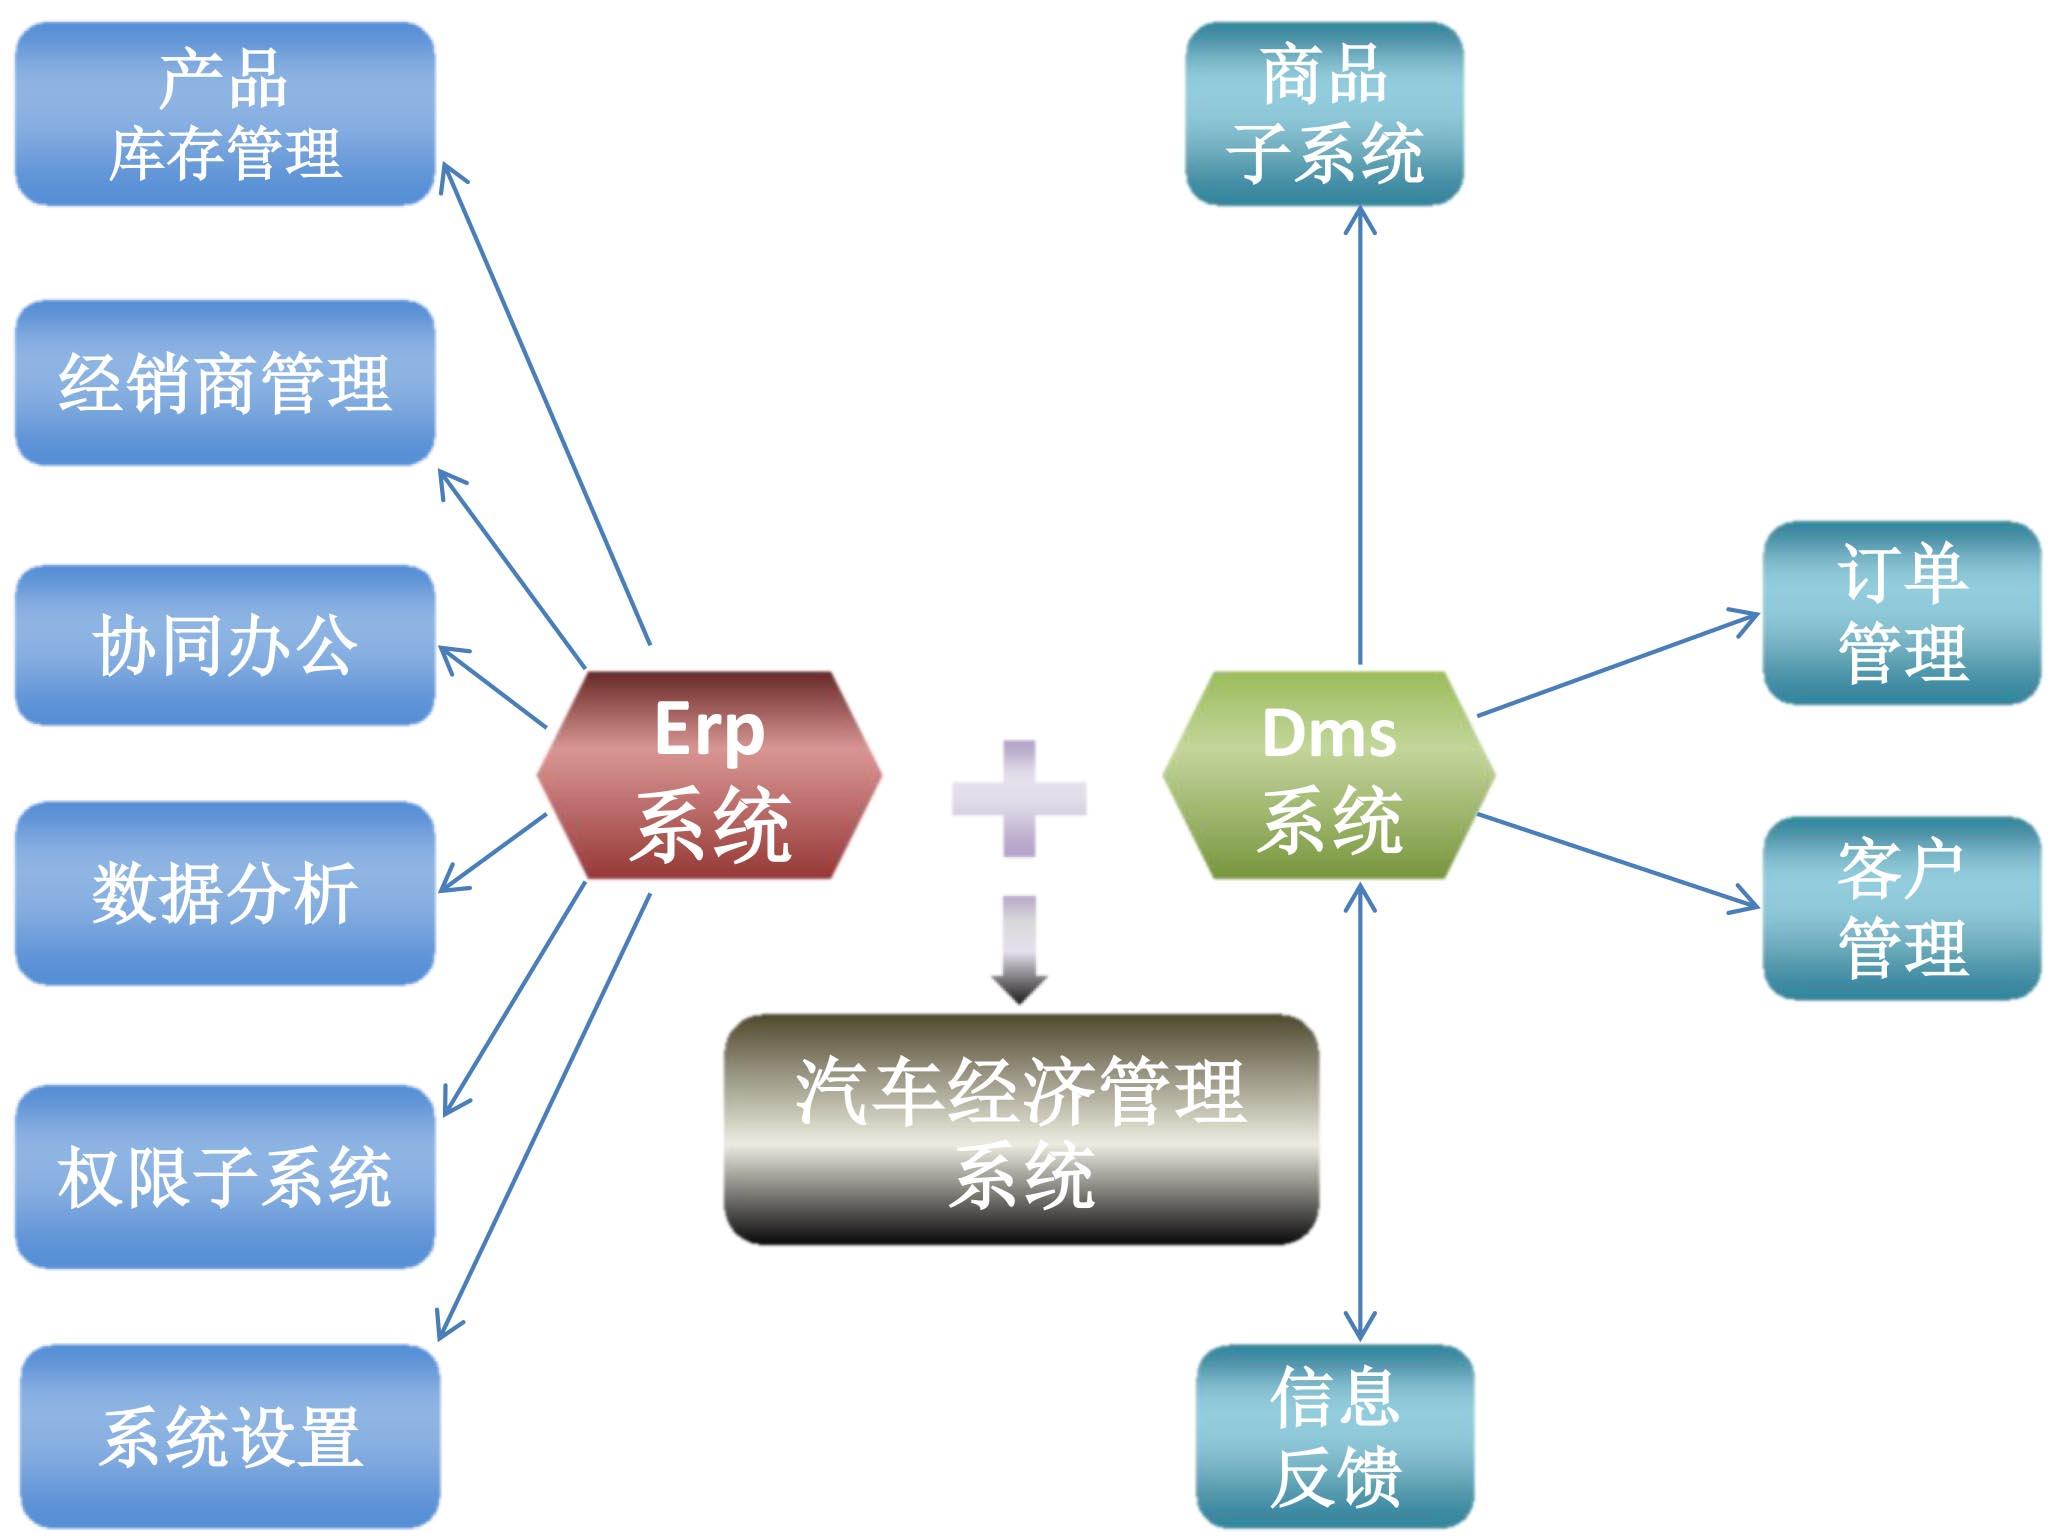 4s企业管理结构图